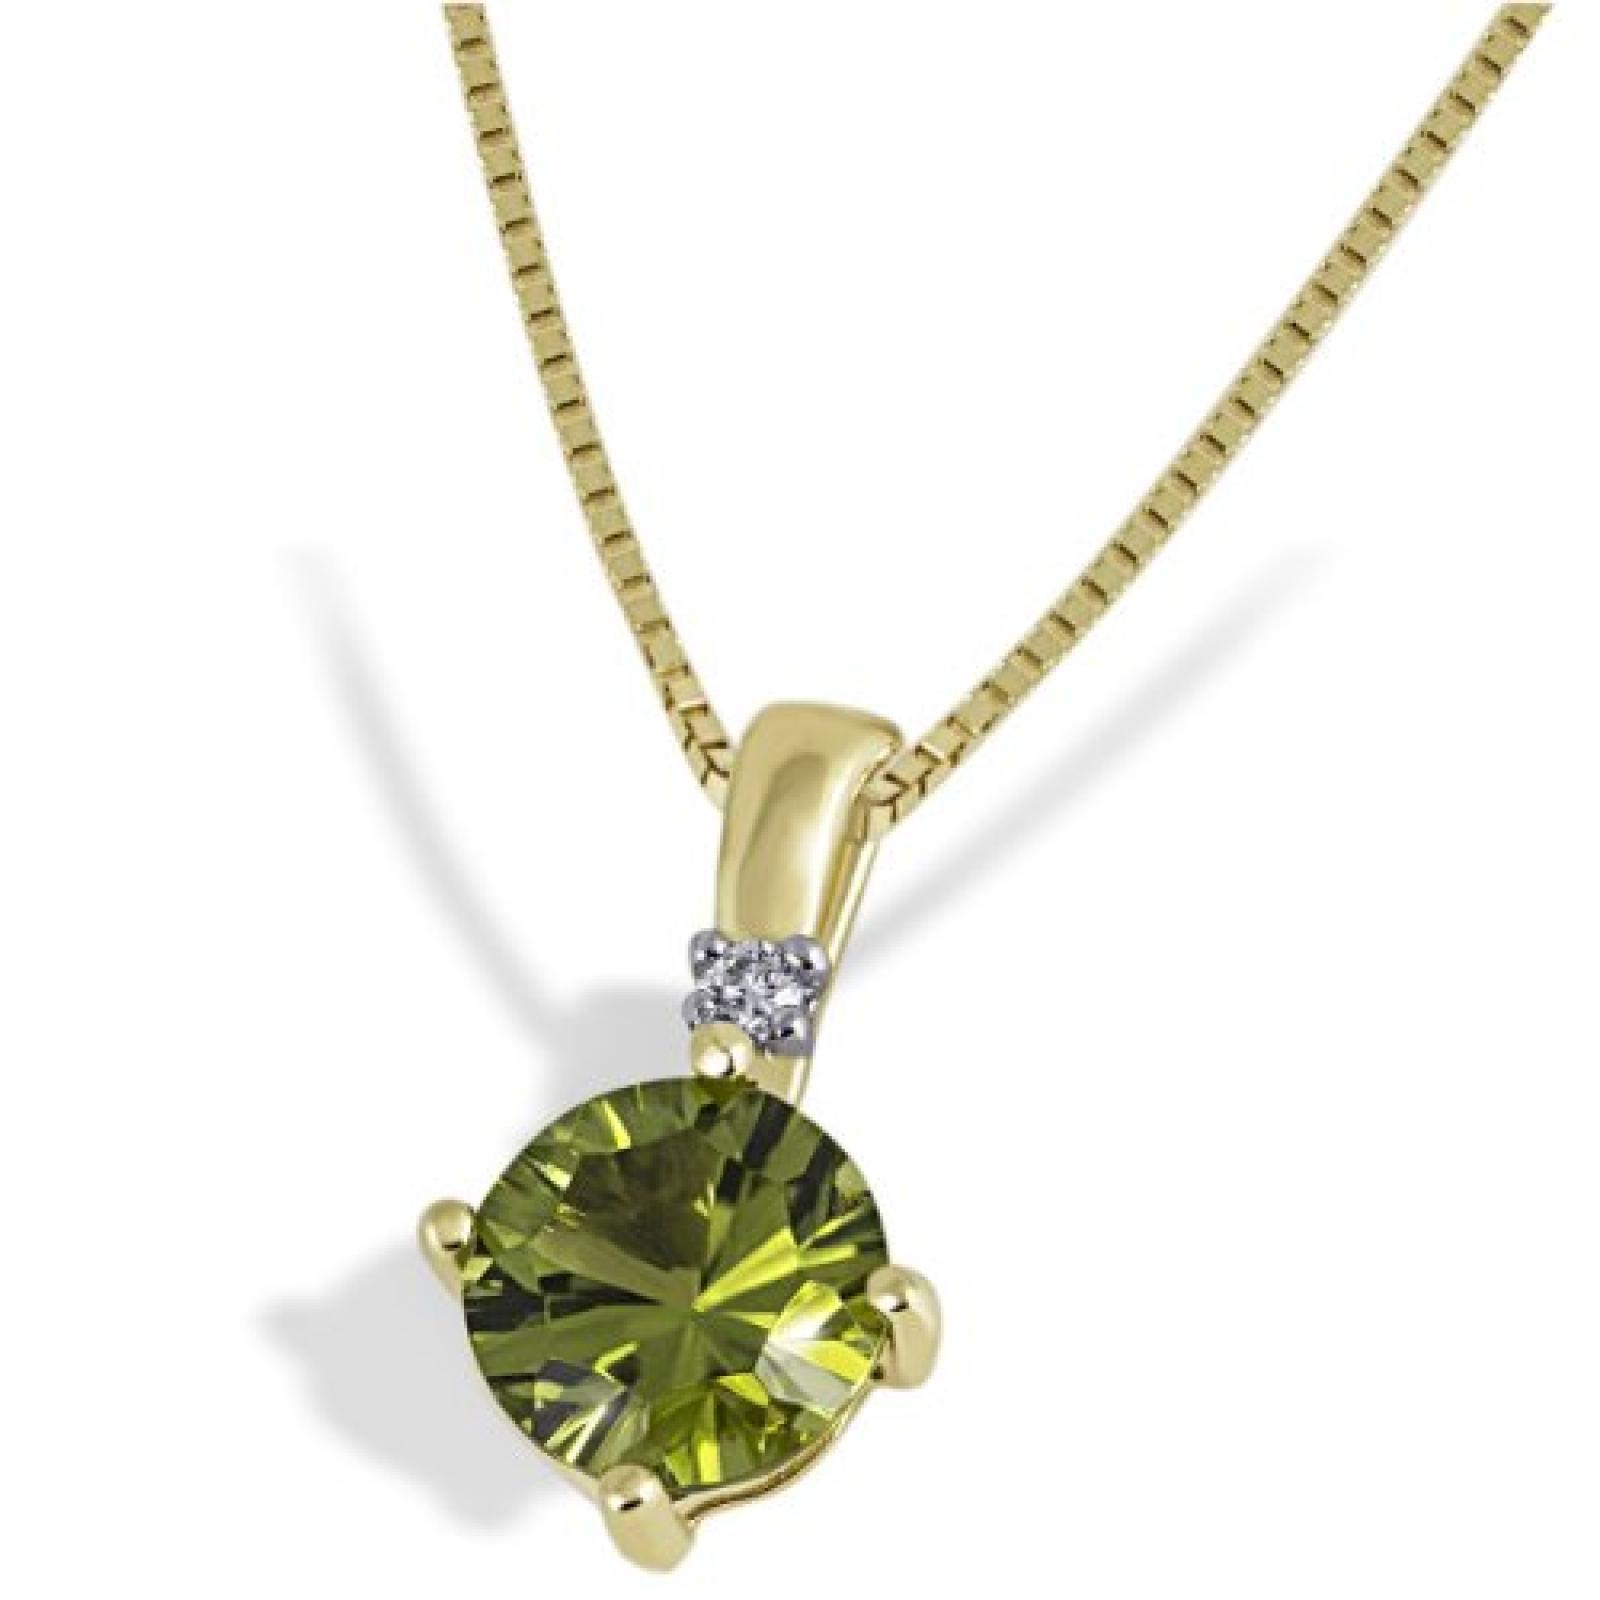 goldmaid Damen-Halskette 333 Gelbgold 1 Peridot 1 Brillant 0,03ct C973GG